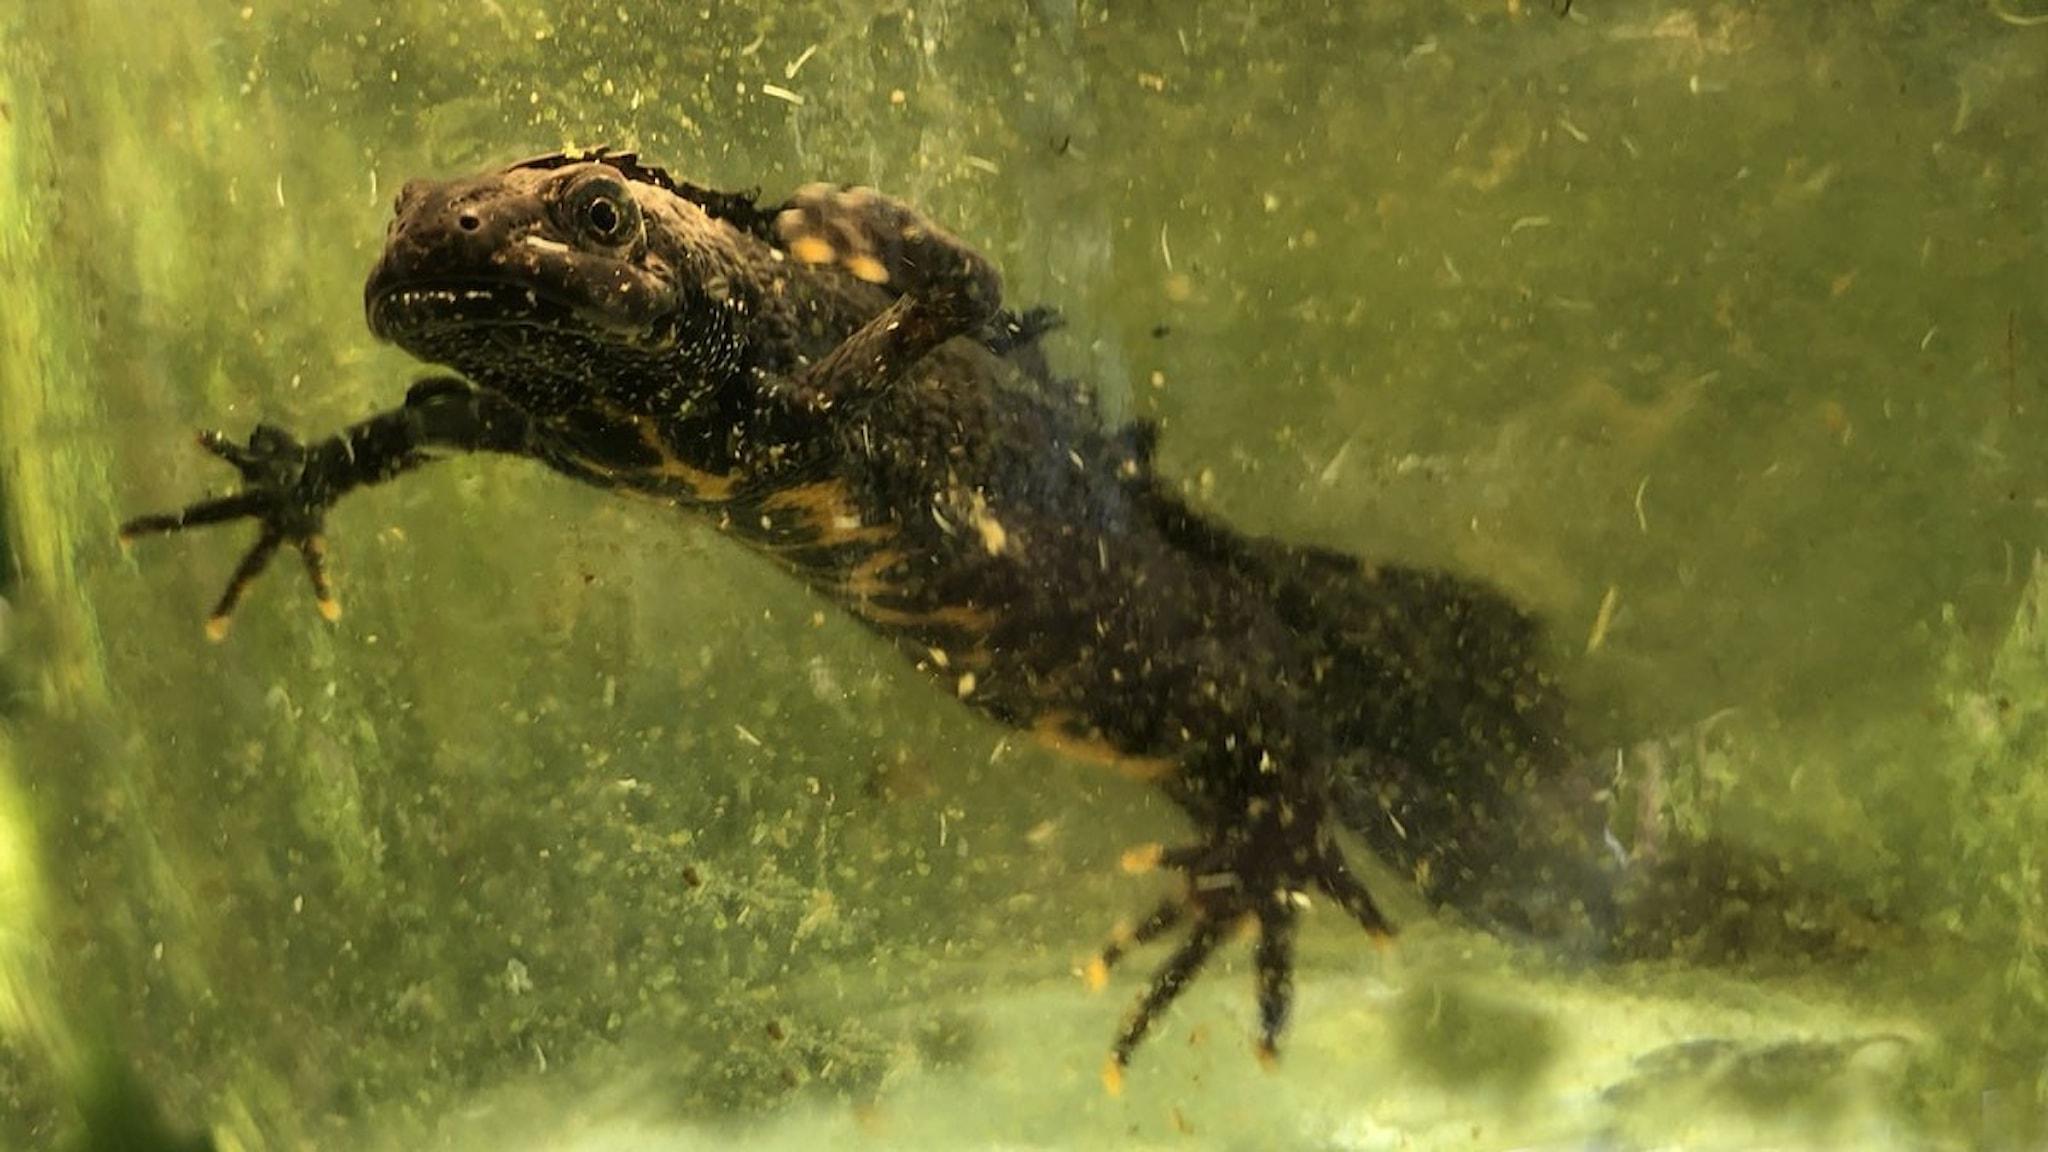 en vattensalamander under vattnet